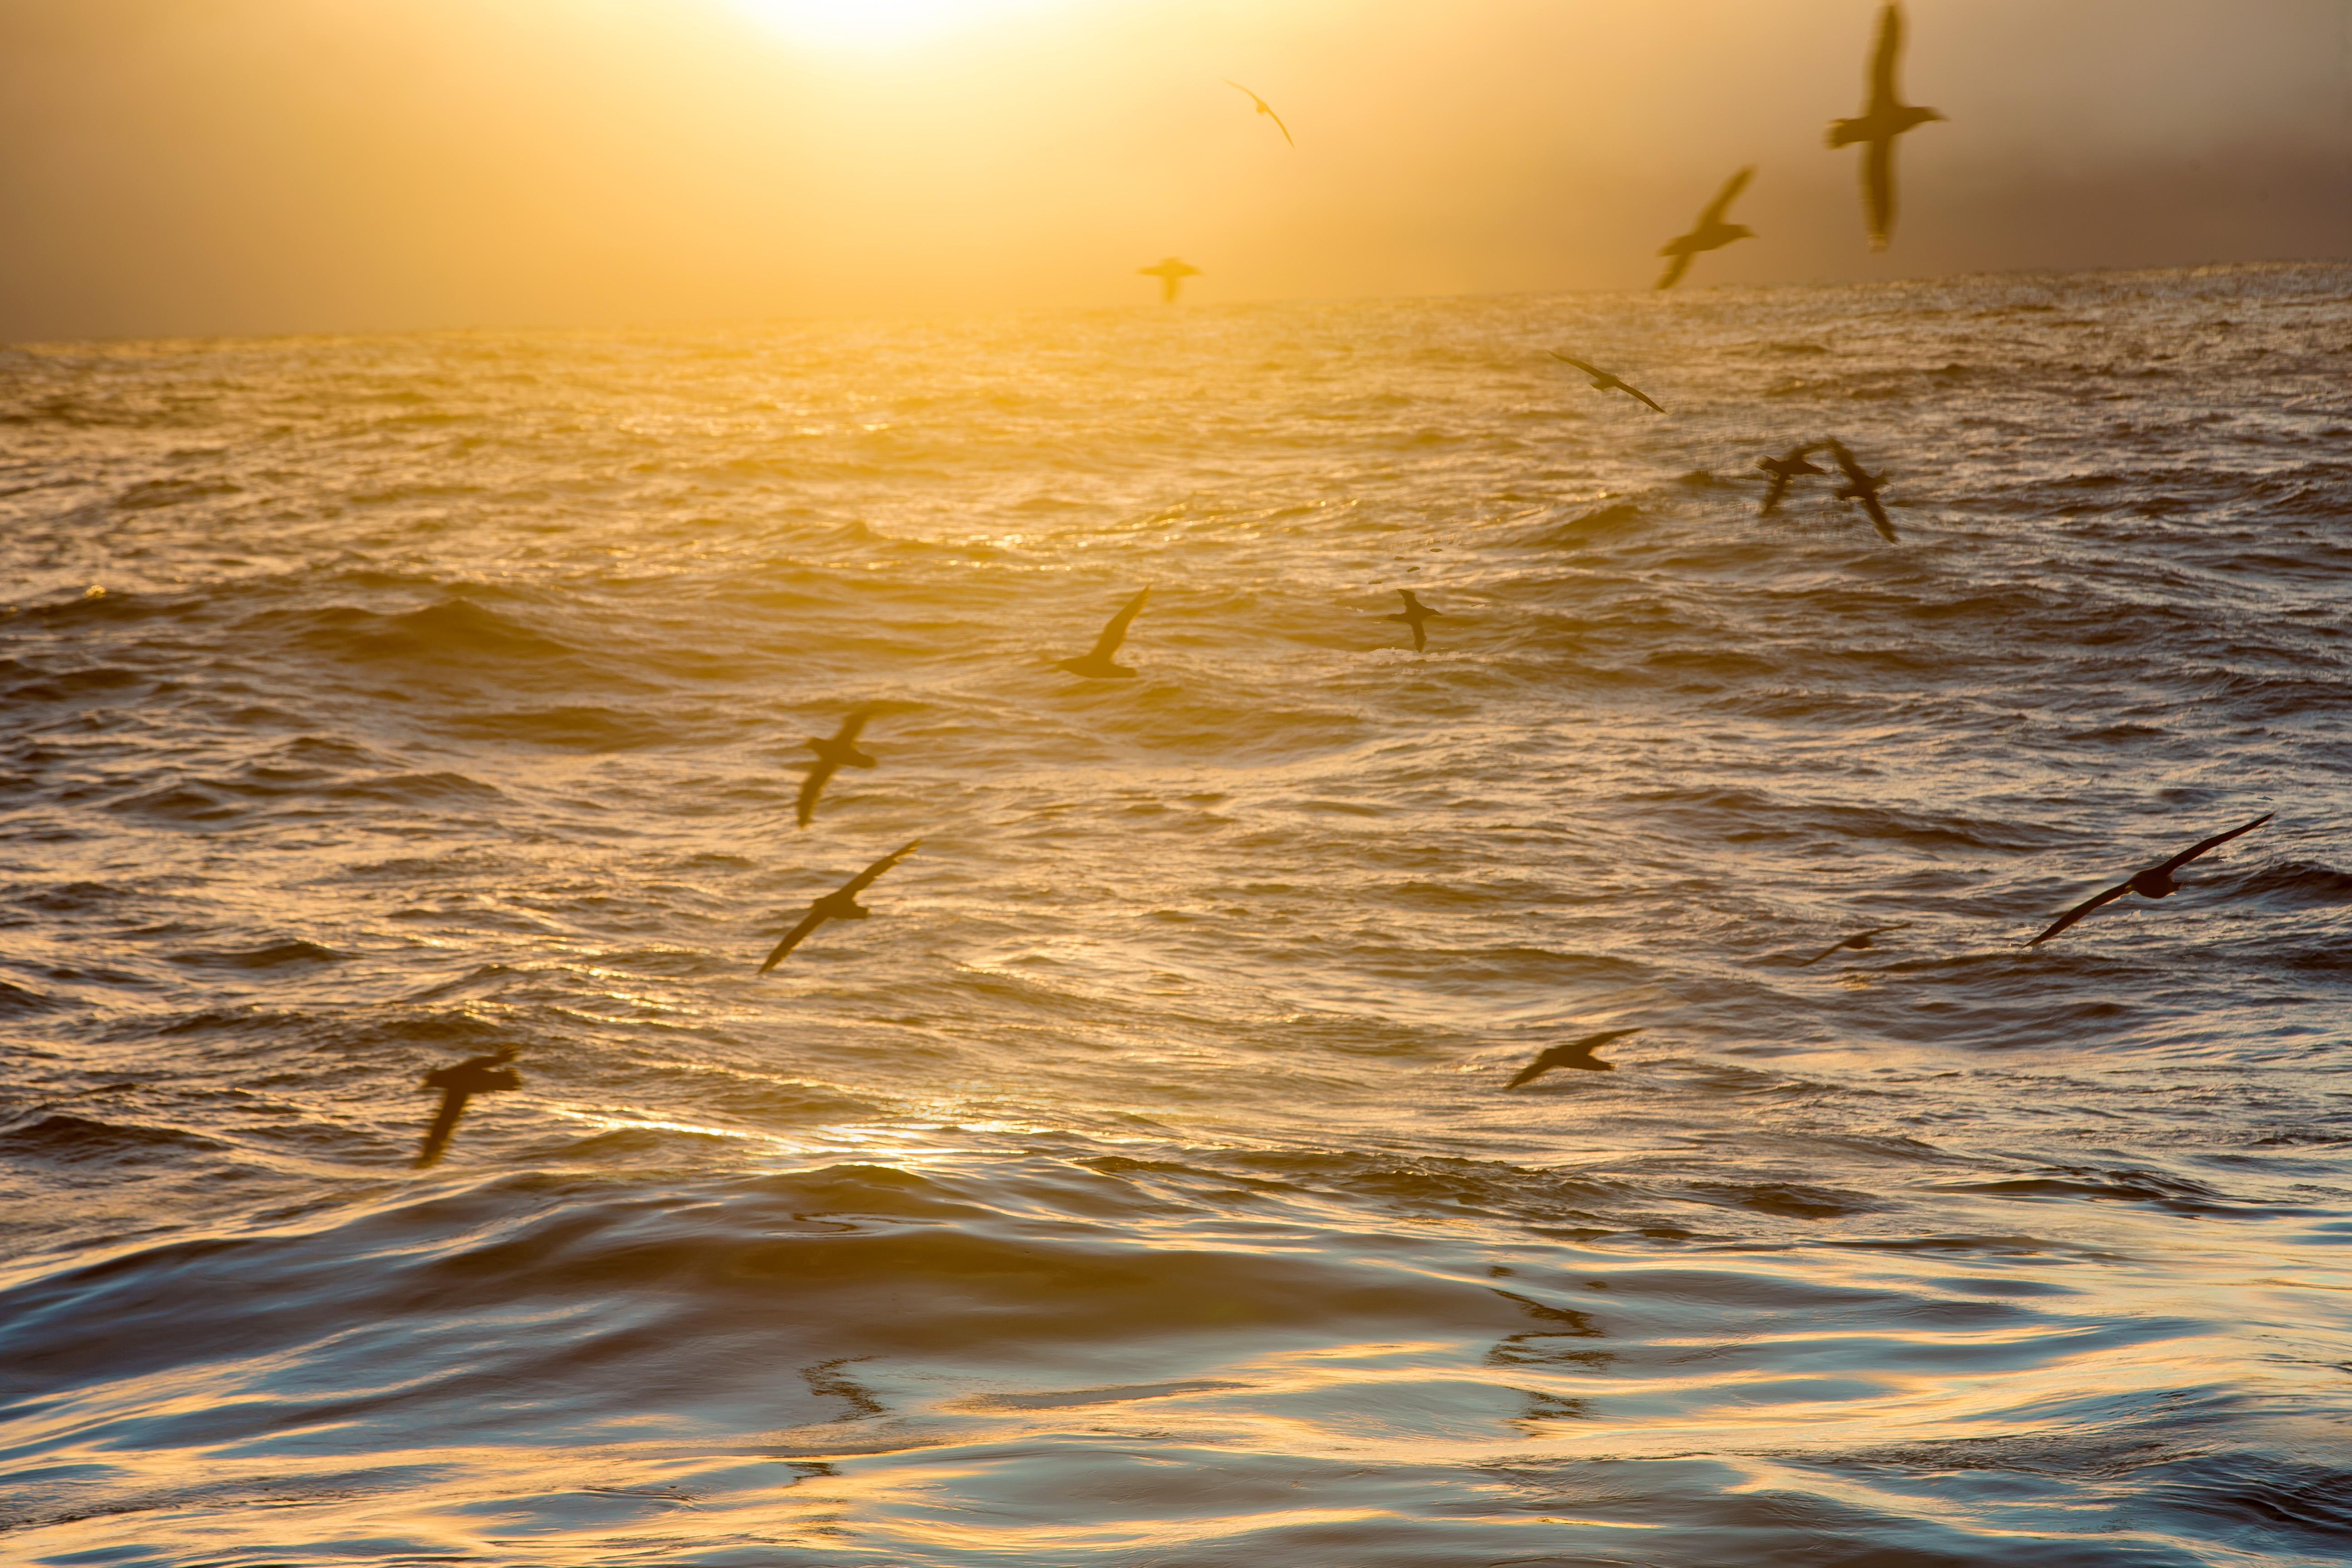 Birding_Sunrise petrels